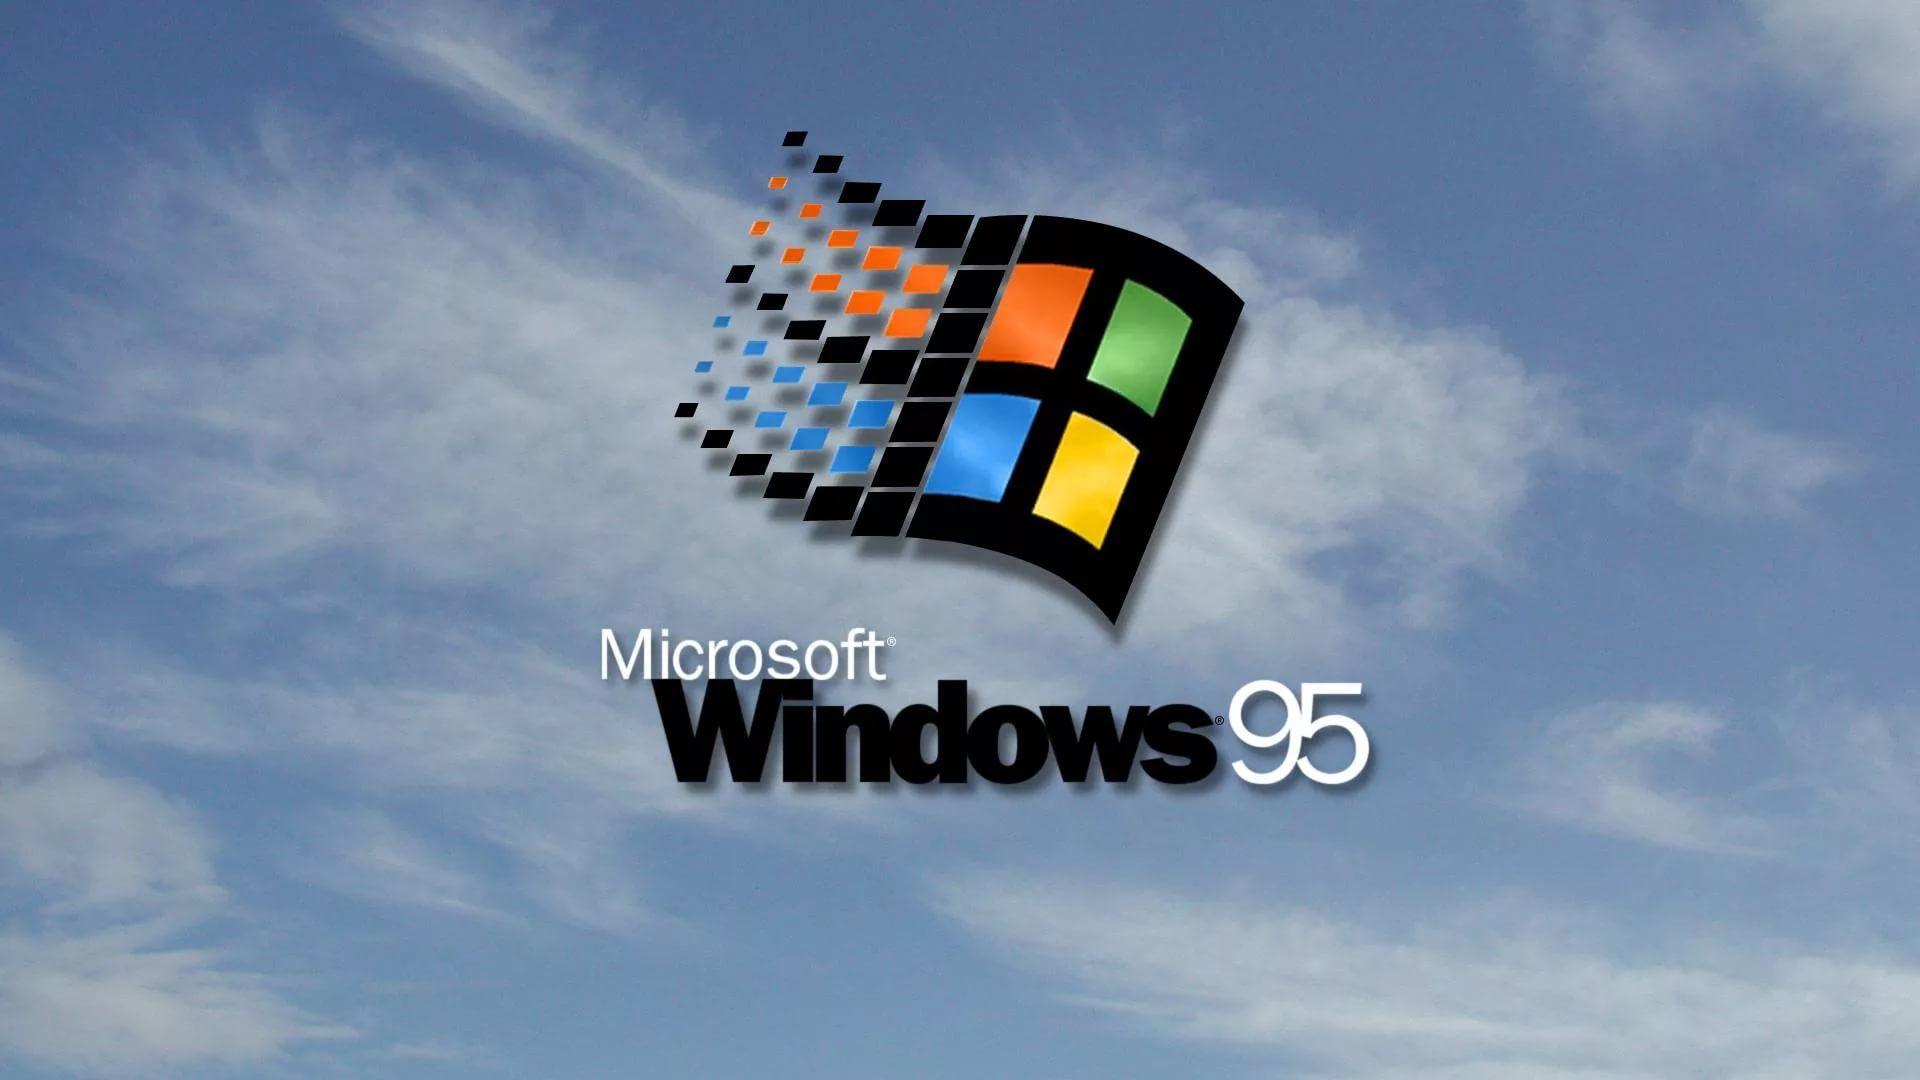 Windows Nice Wallpaper